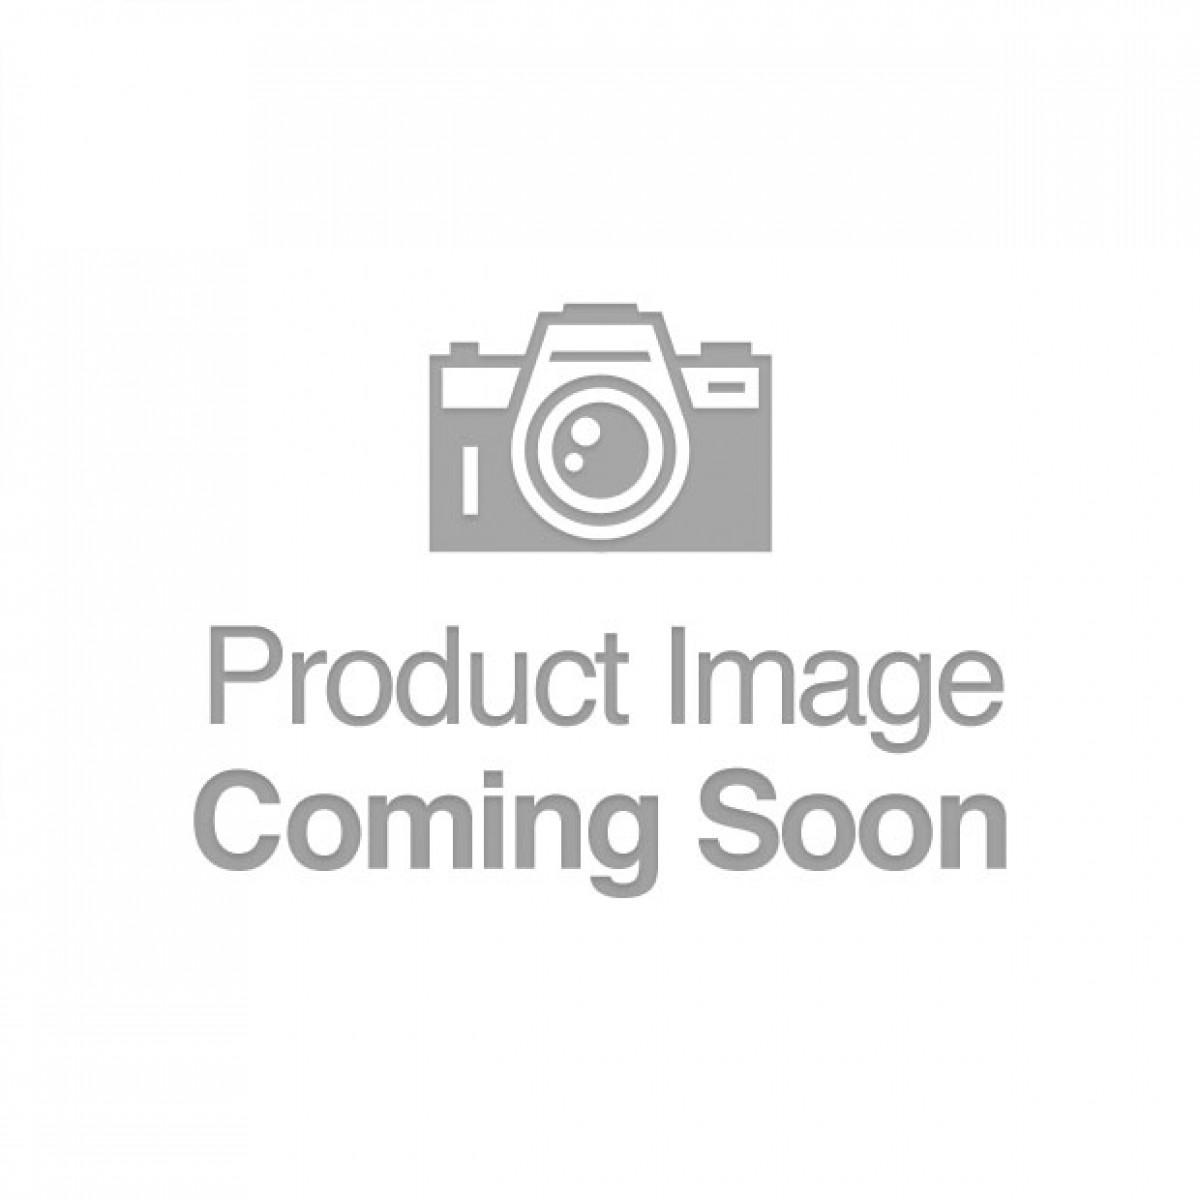 Dorcel Deep Expand Inflatable Vibrator - Black/Gold